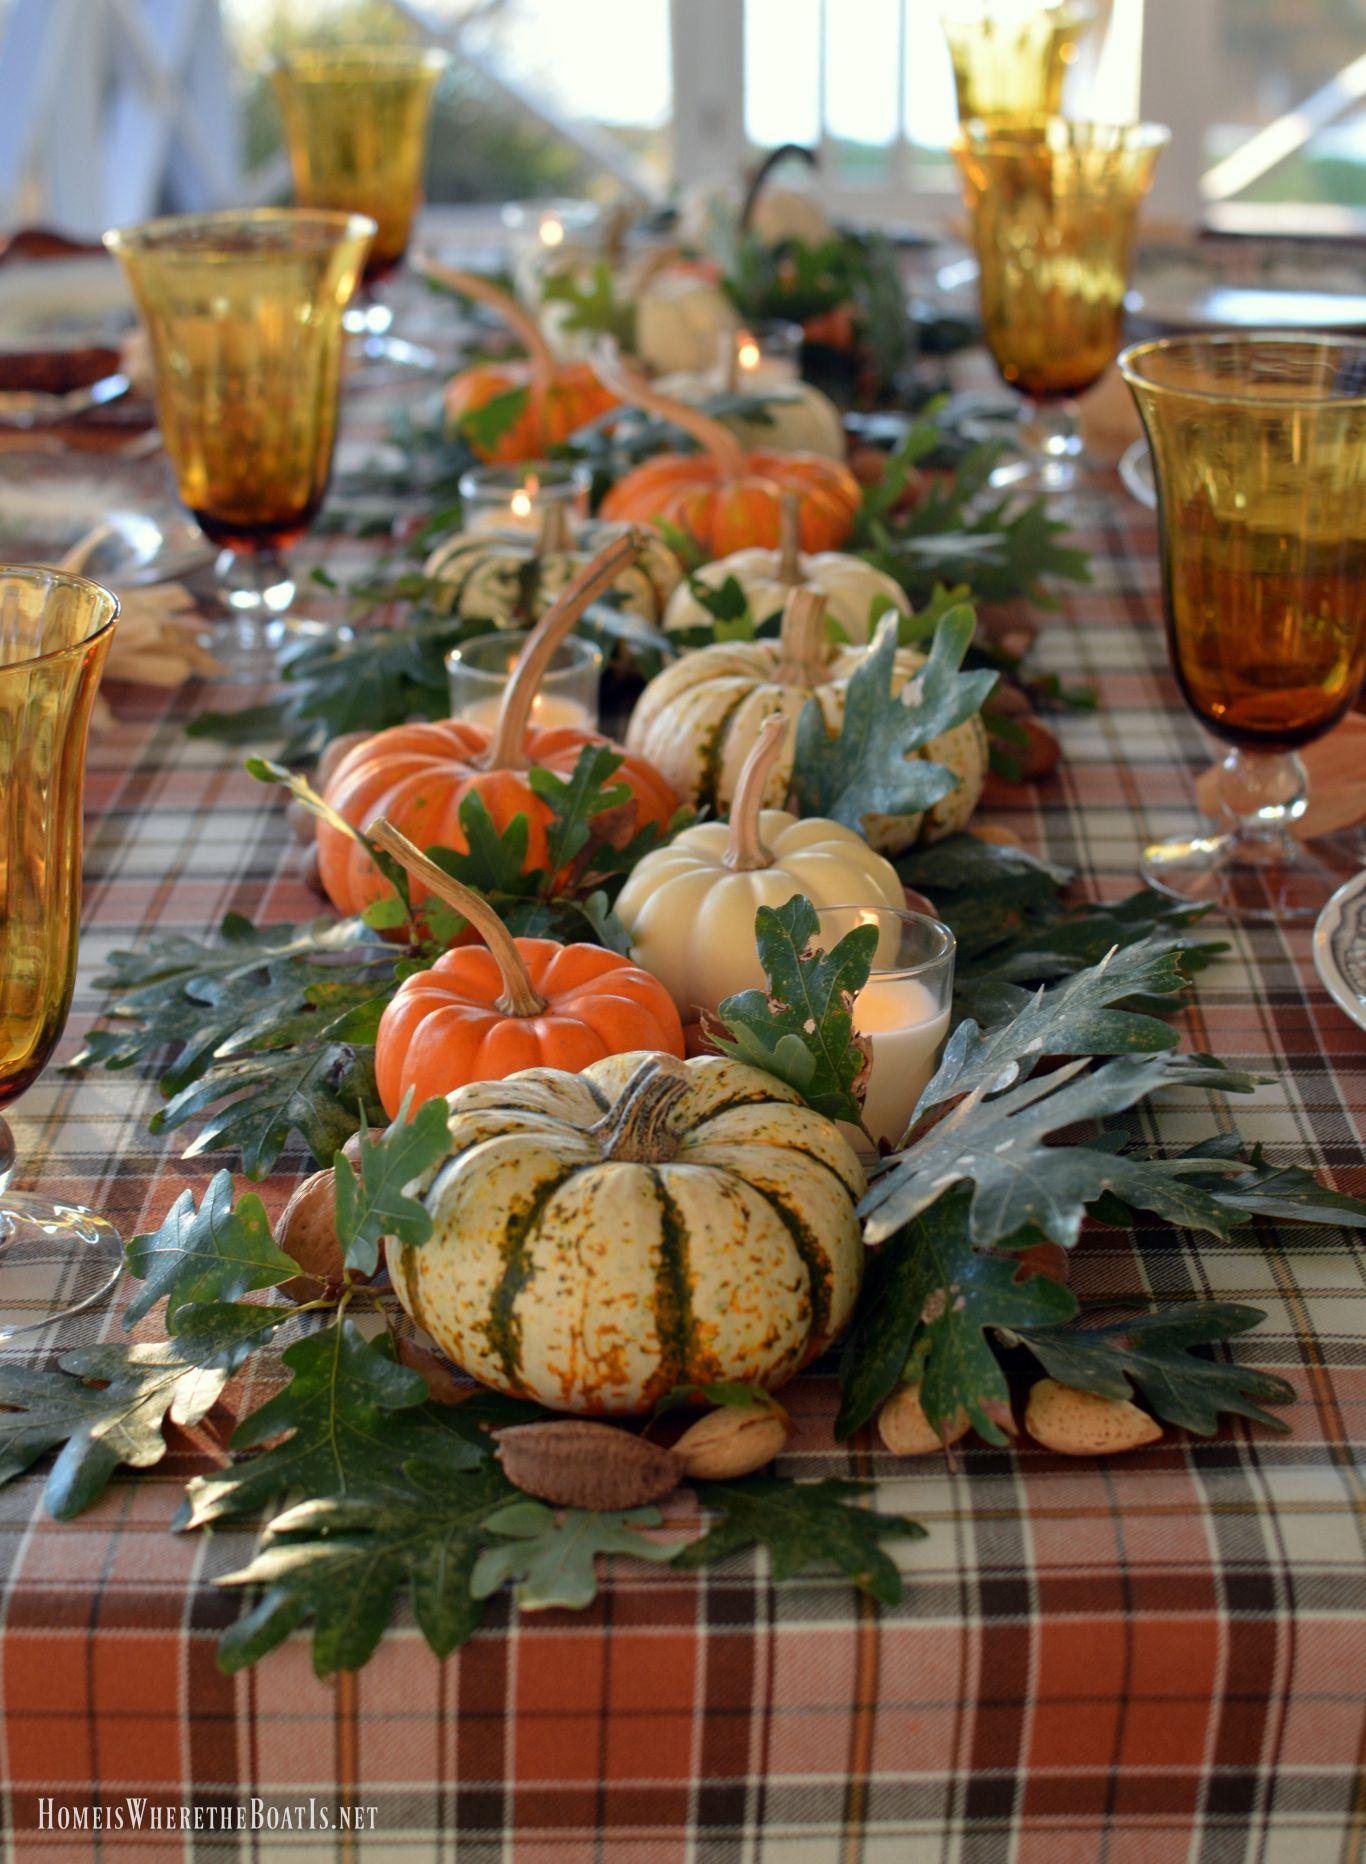 Seasonal or Holiday Table Centerpiece DIY Holiday table